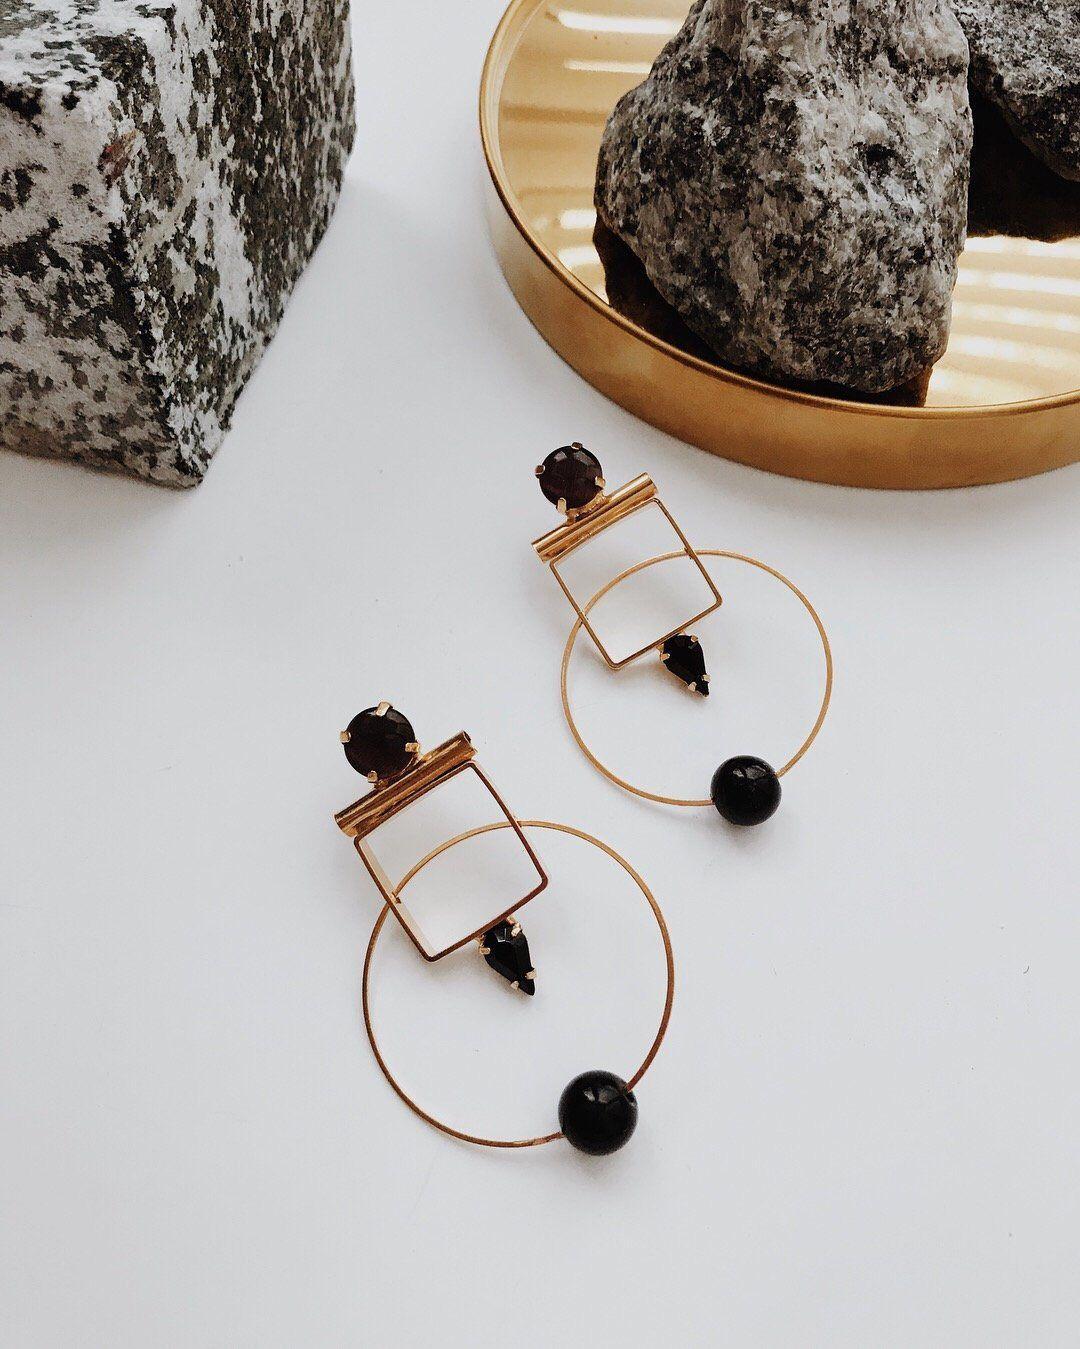 gift for her handmade art jewelry abstract jewelry african motives oval shape Geometric mosaic earrings asymmetric ornaments earrings